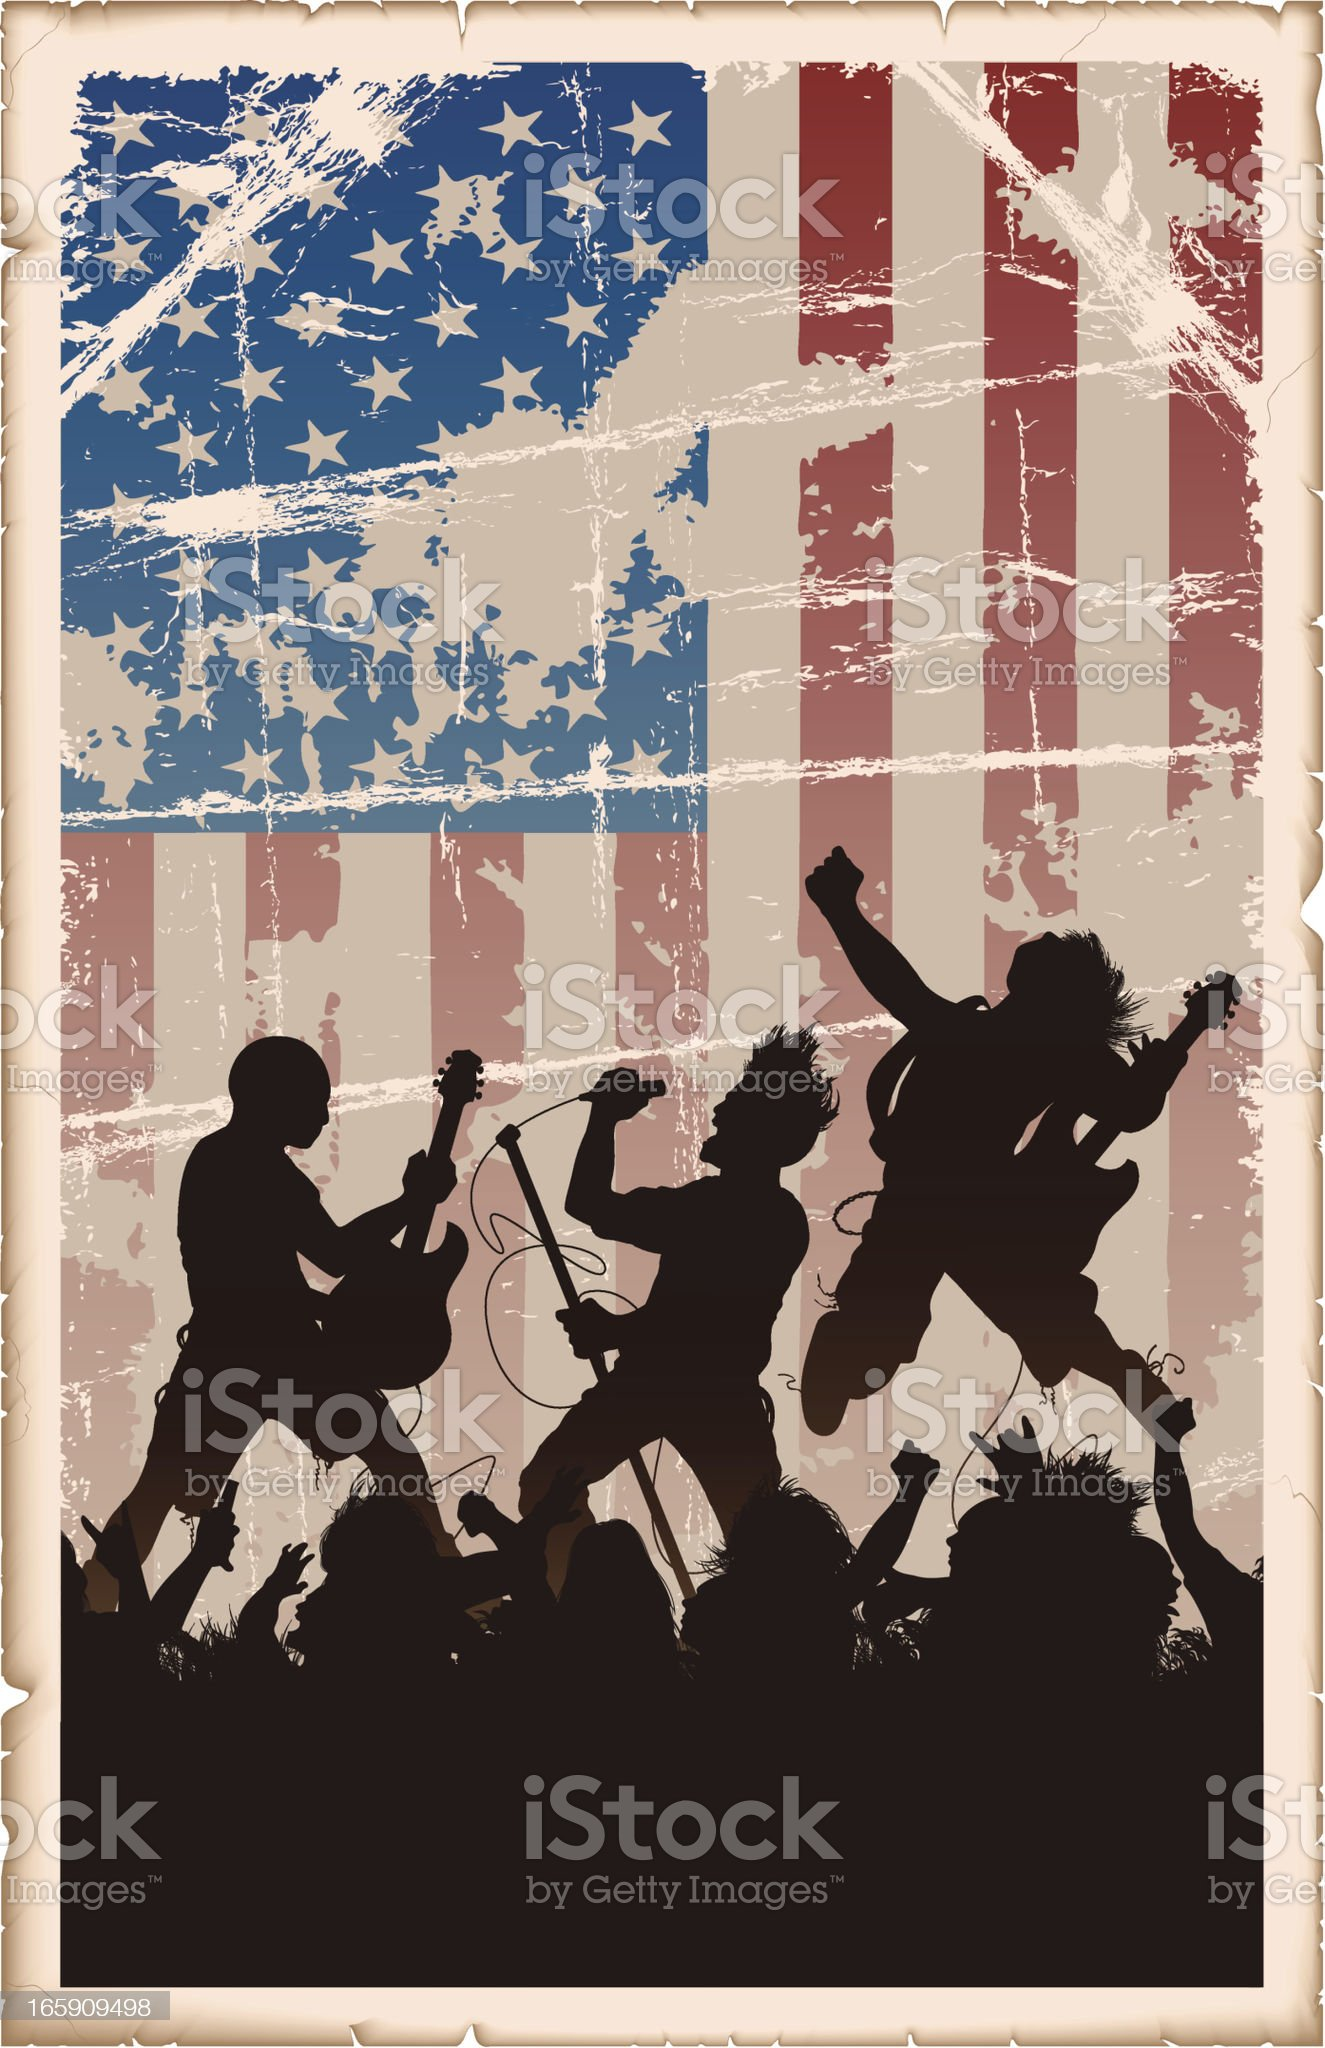 Vintage American Rock Poster royalty-free stock vector art